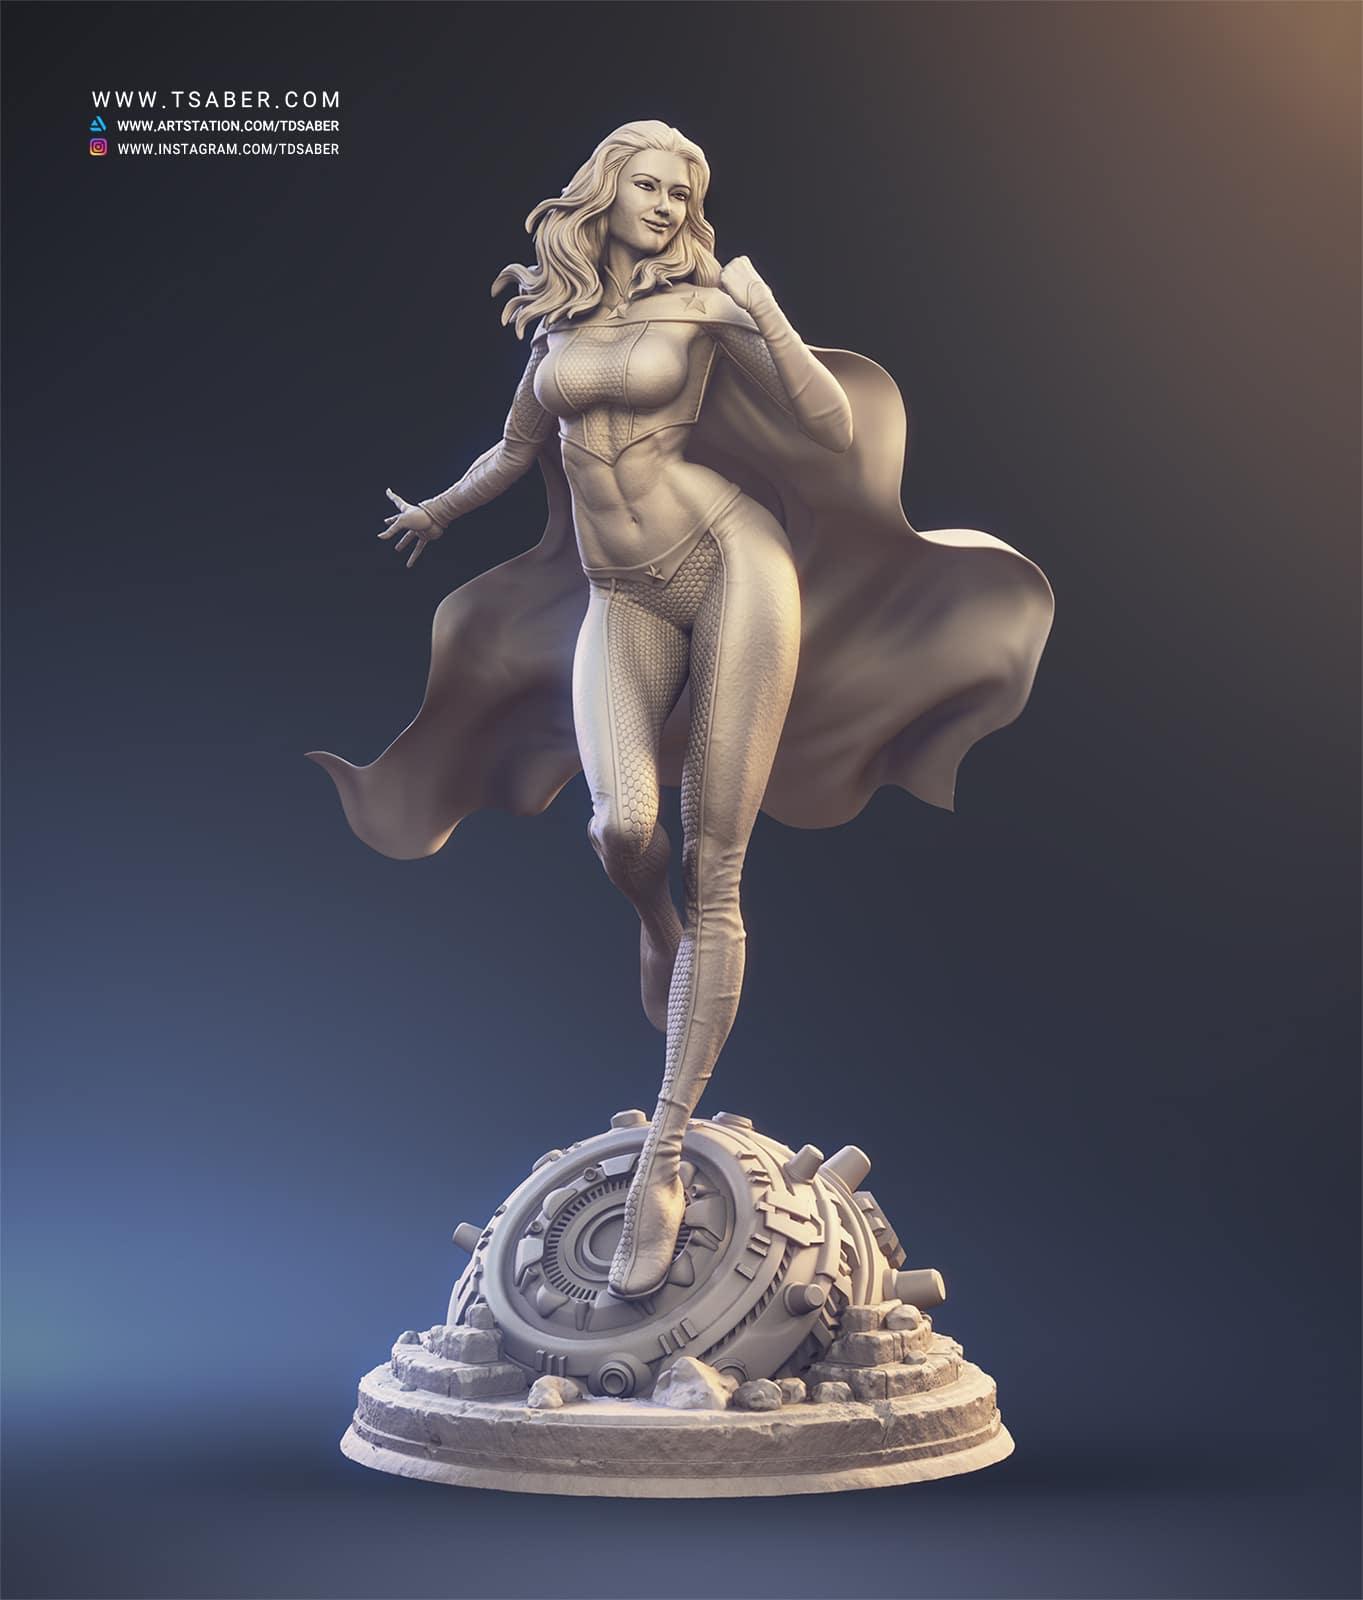 American Star - Zbrush Superhero Statue - Tsaber